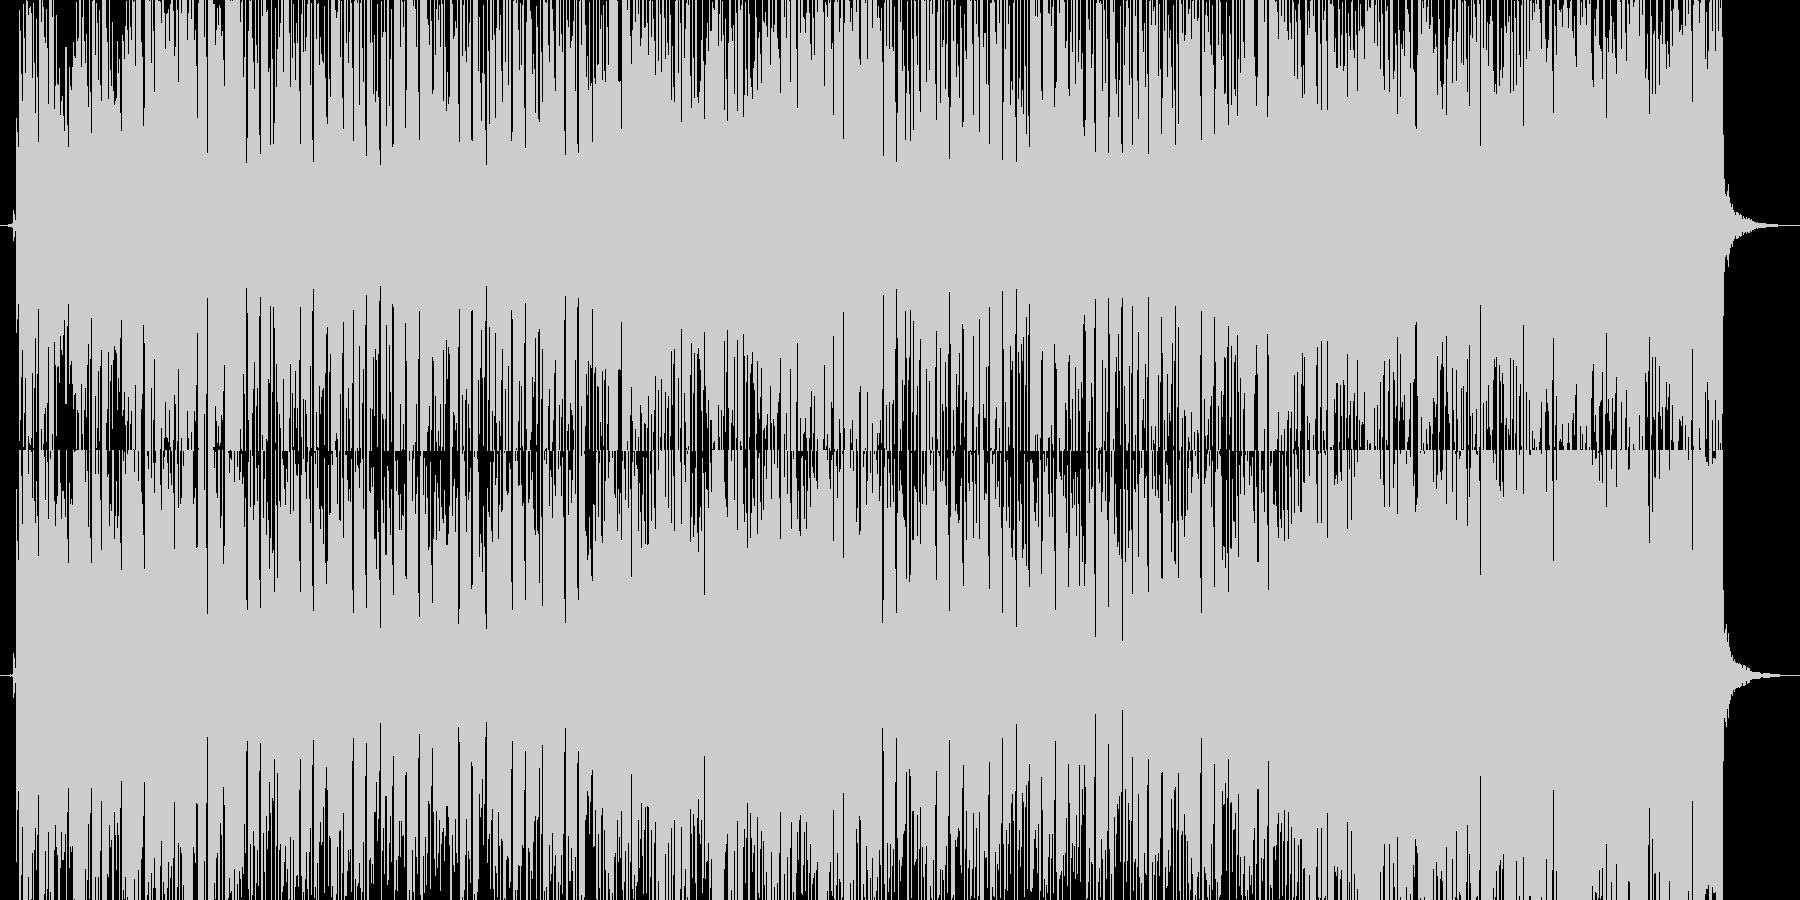 JIINO/セクシーなディスコ曲の未再生の波形